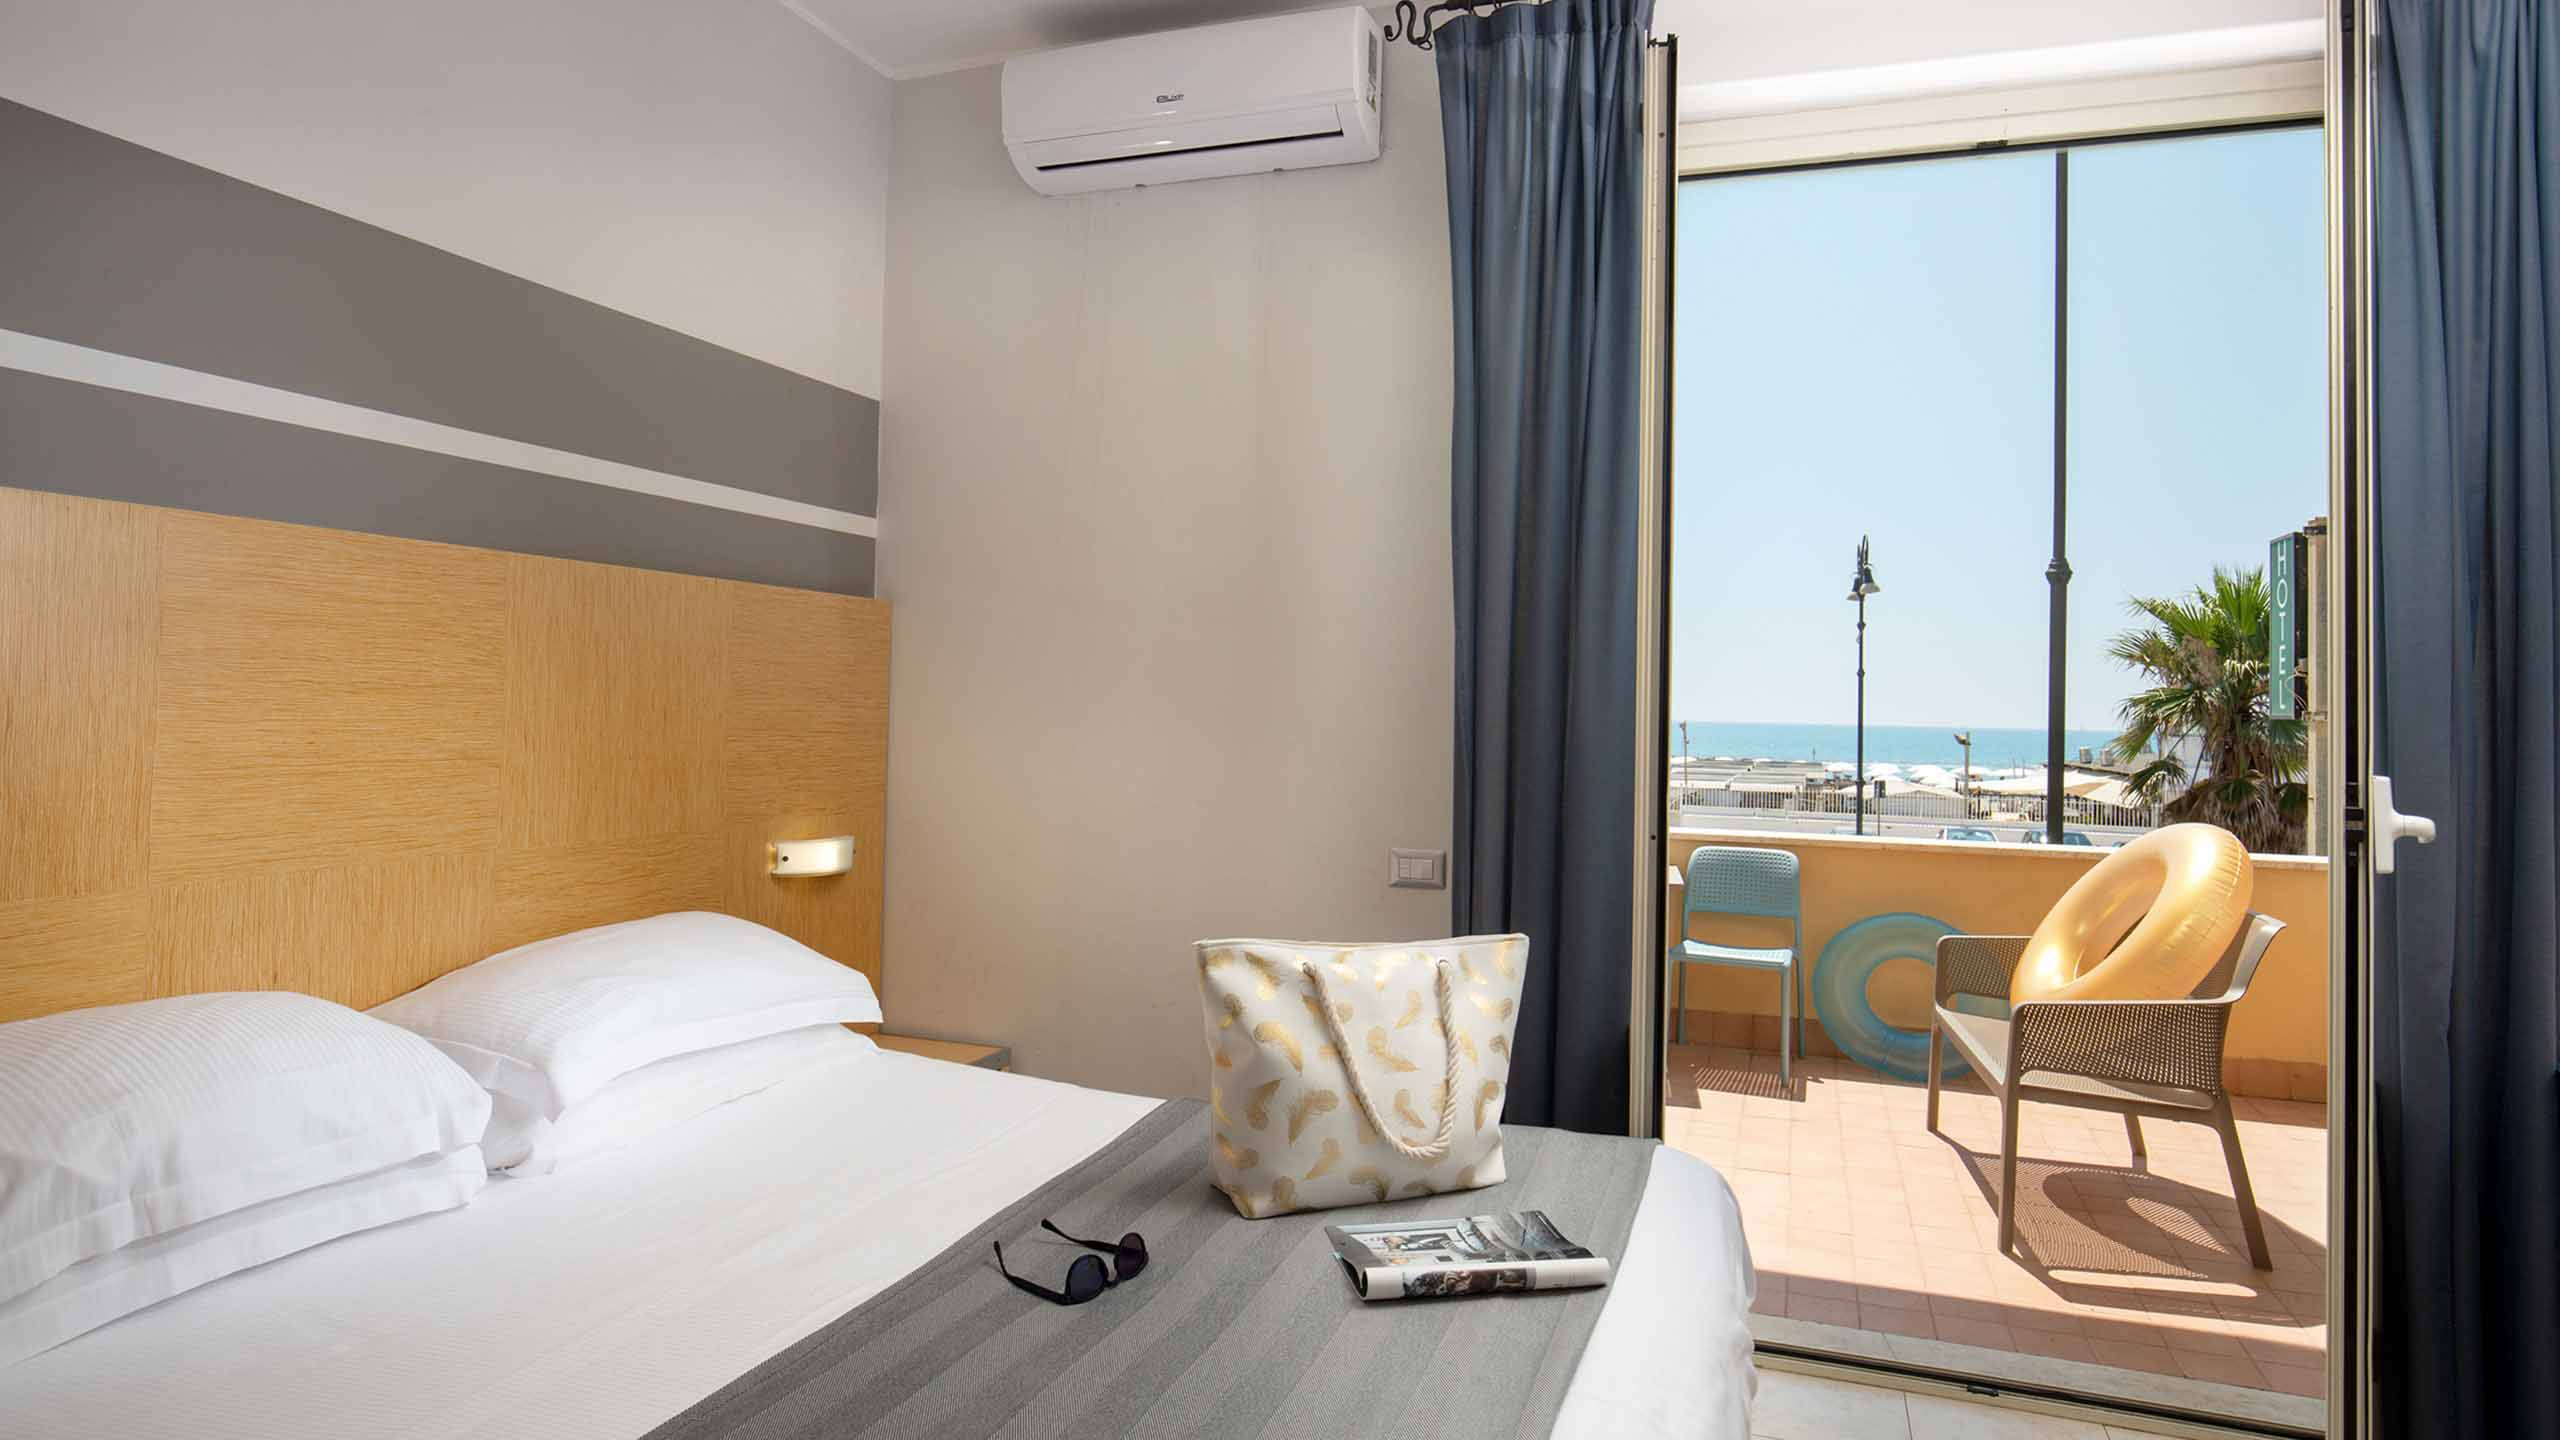 Hotel-La-Scaletta-Ostia-twin-room-with-view-7